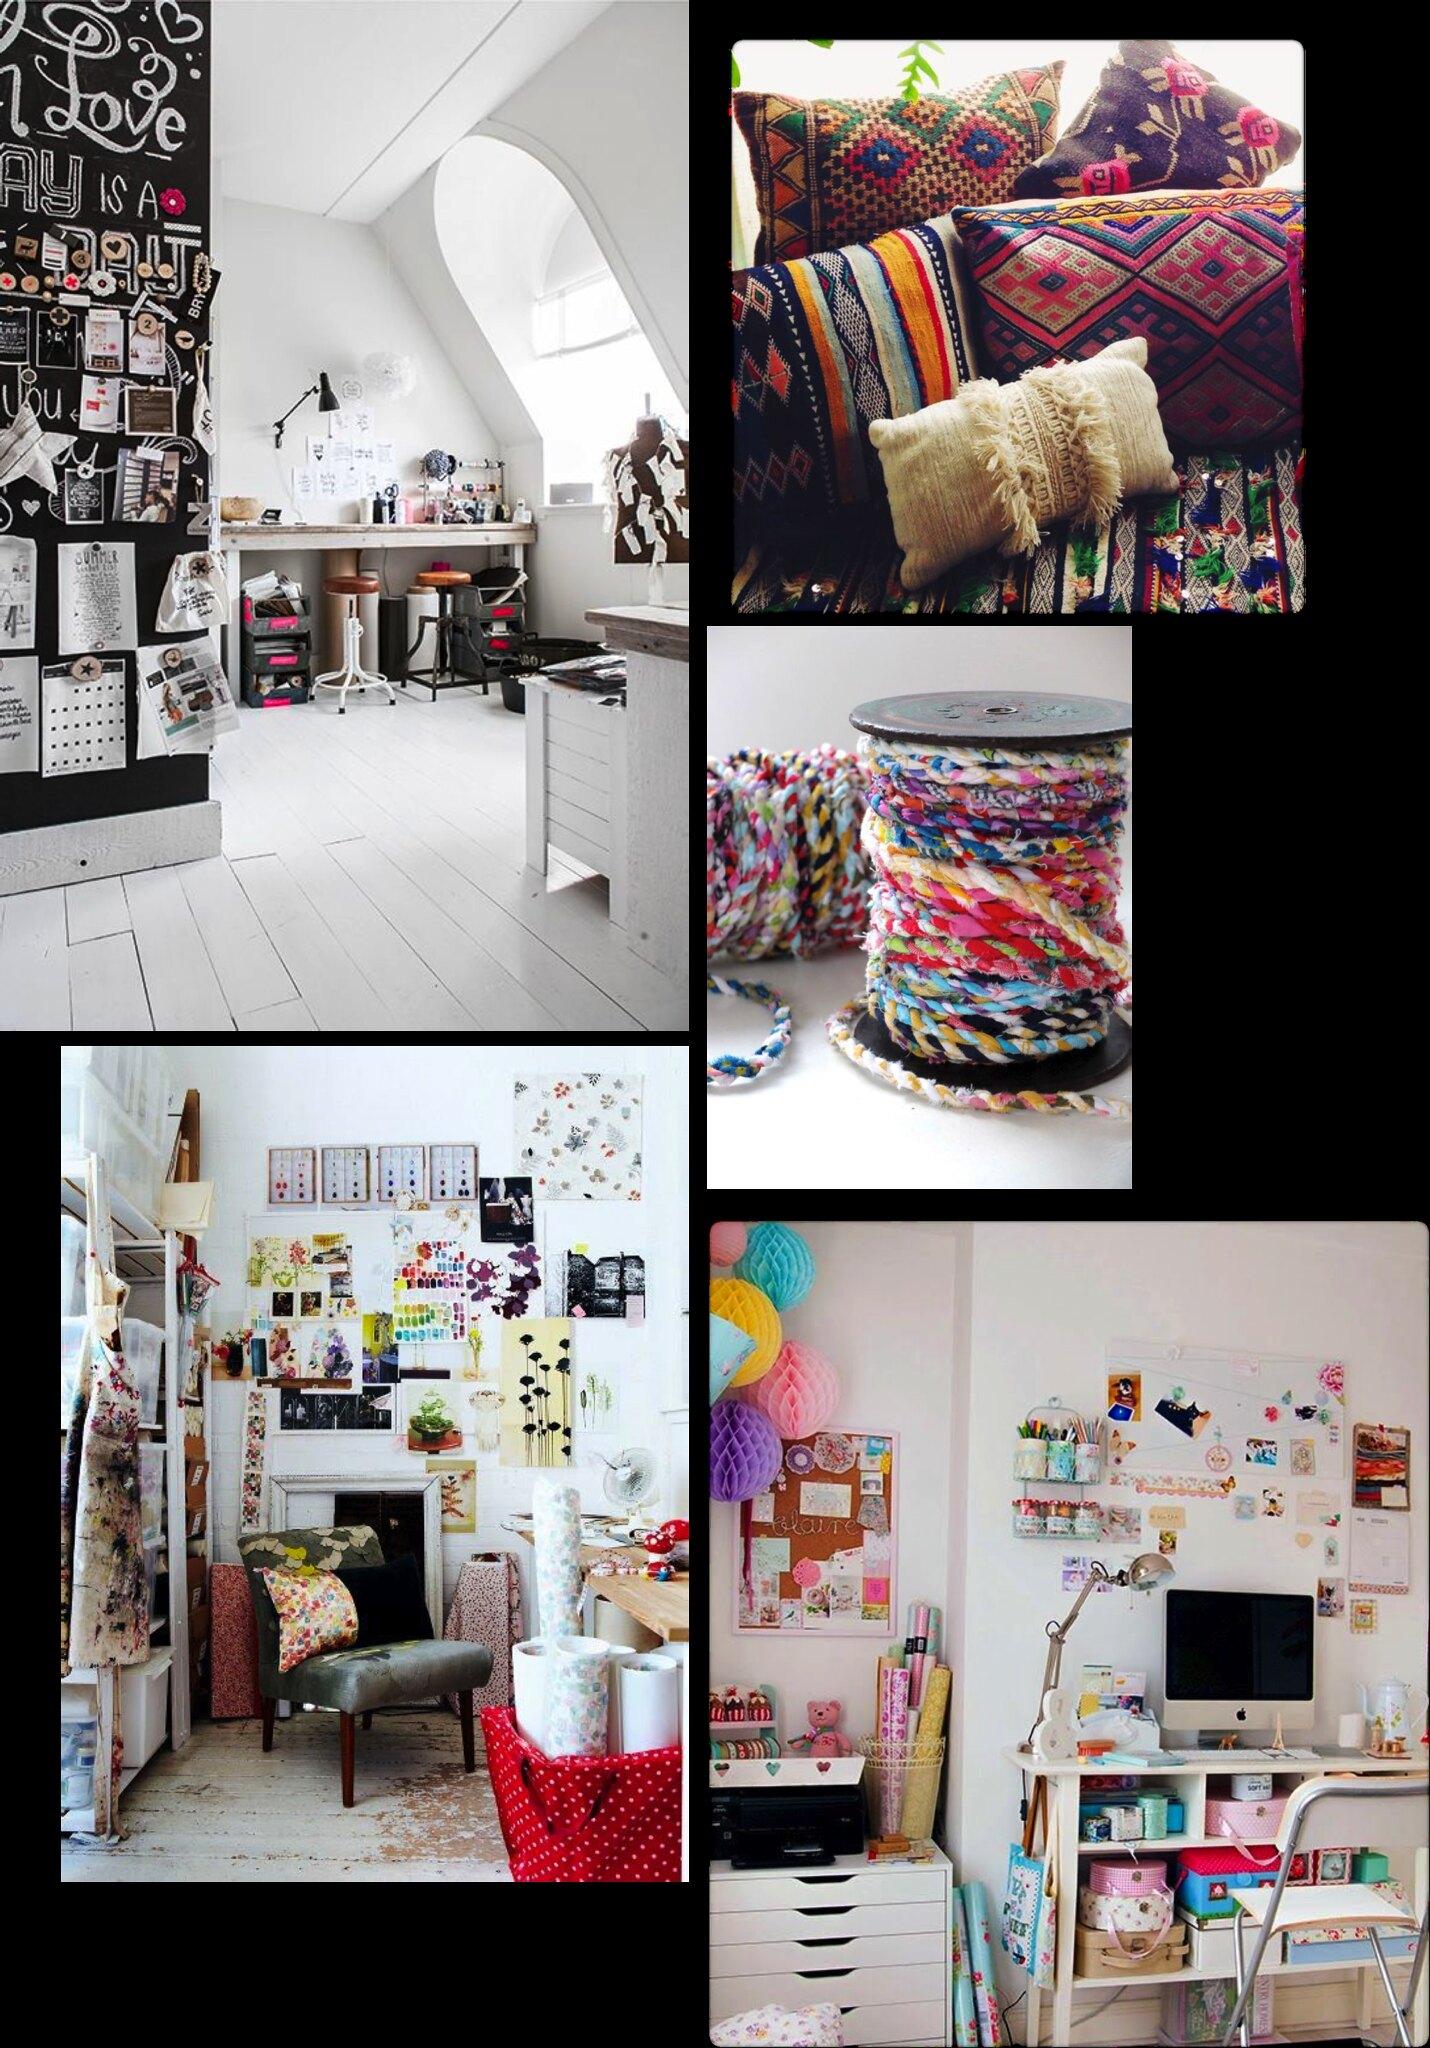 studio inspo / pinterest images / kirsty wears blog